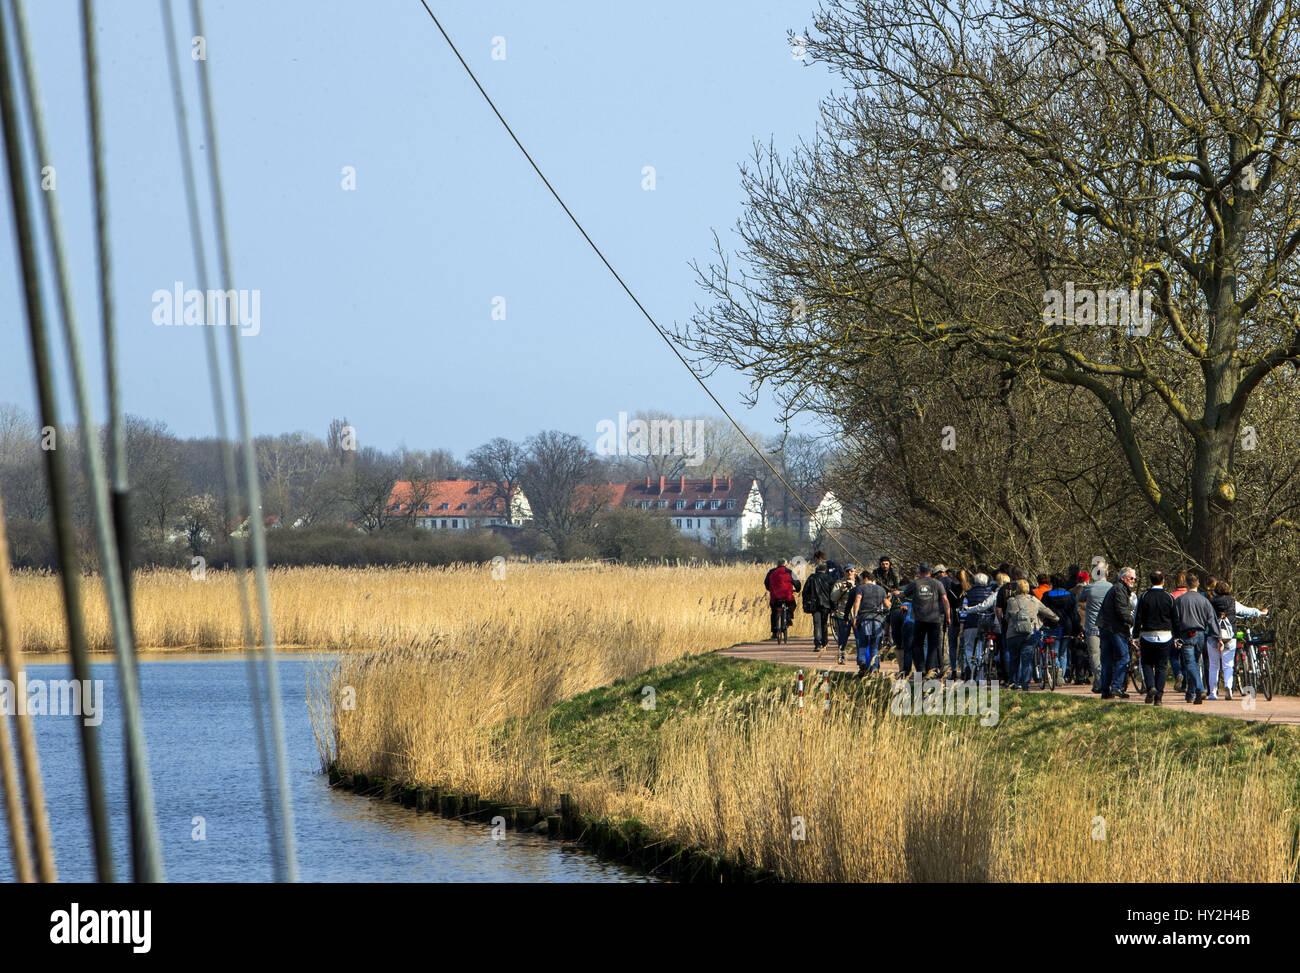 Greifswald, Germany. 1st Apr, 2017. Ten men pull the sailing ship ...